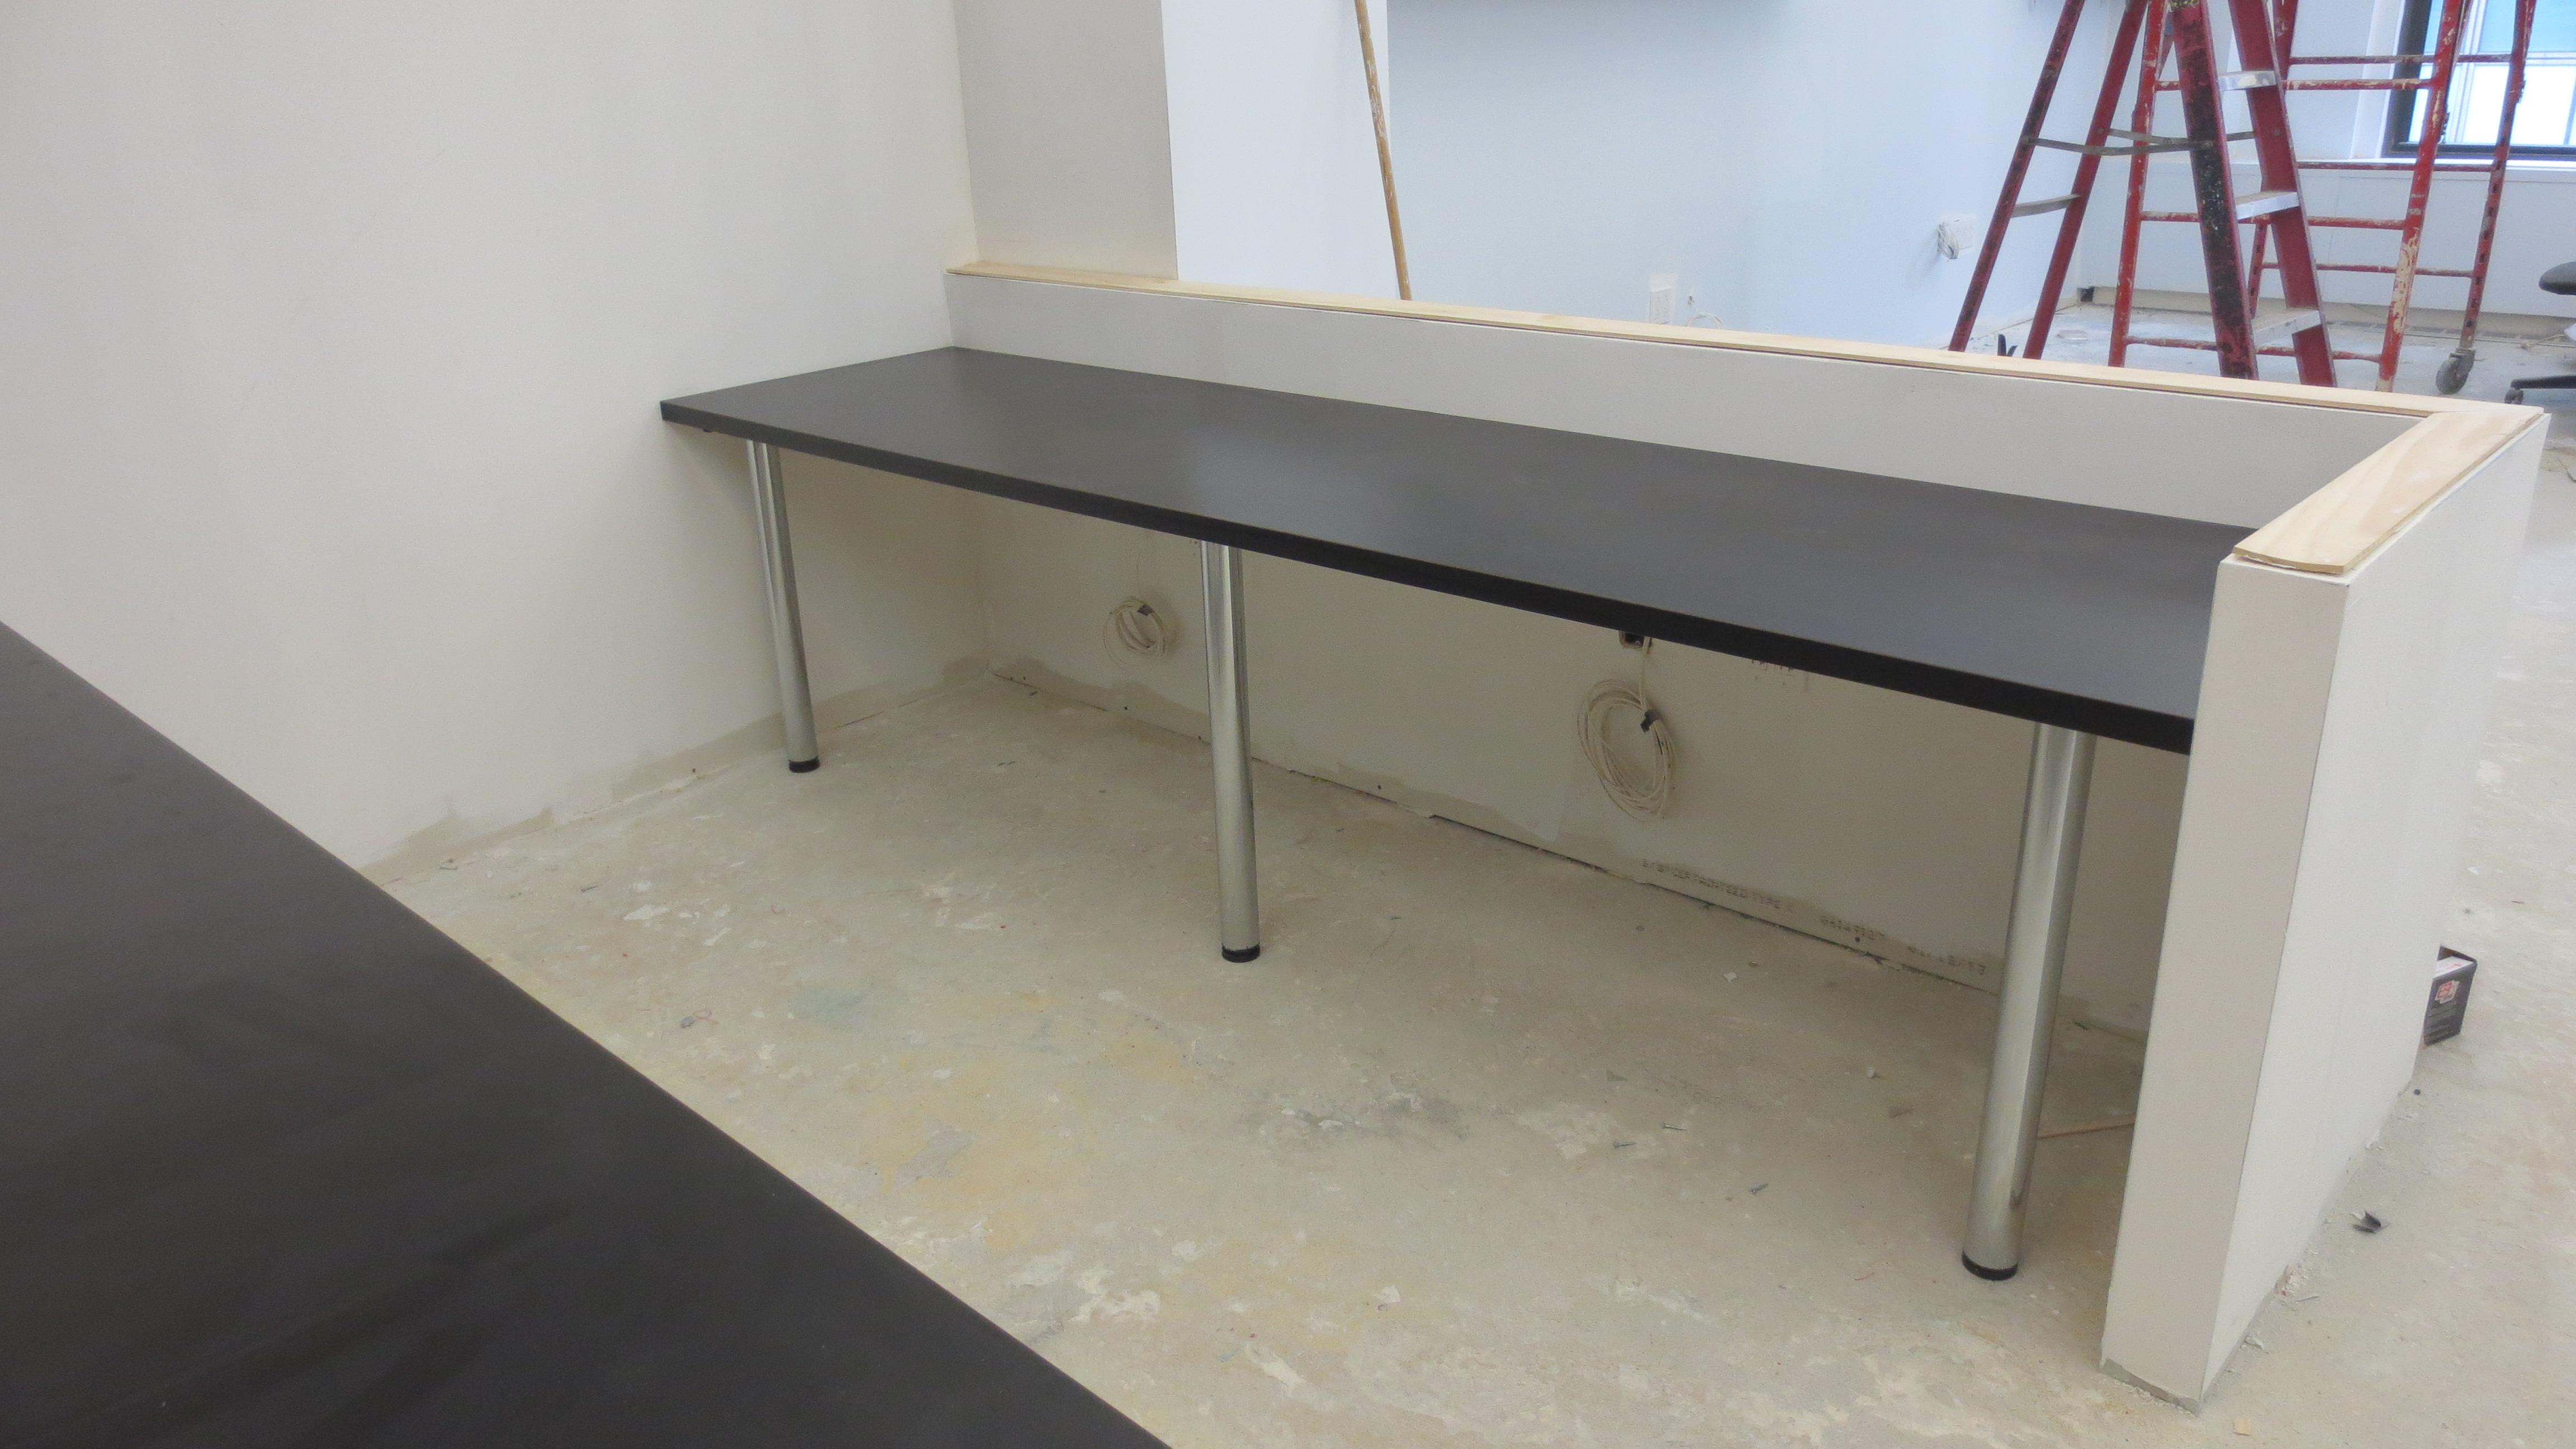 Modern Furniture Mfg. Co. LLC 55 Brook Ave, Suite E, Deer Park, NY 11729  631 243 6266 Or 516 378 3400 914 946 4105. Fax: 631 243 6276